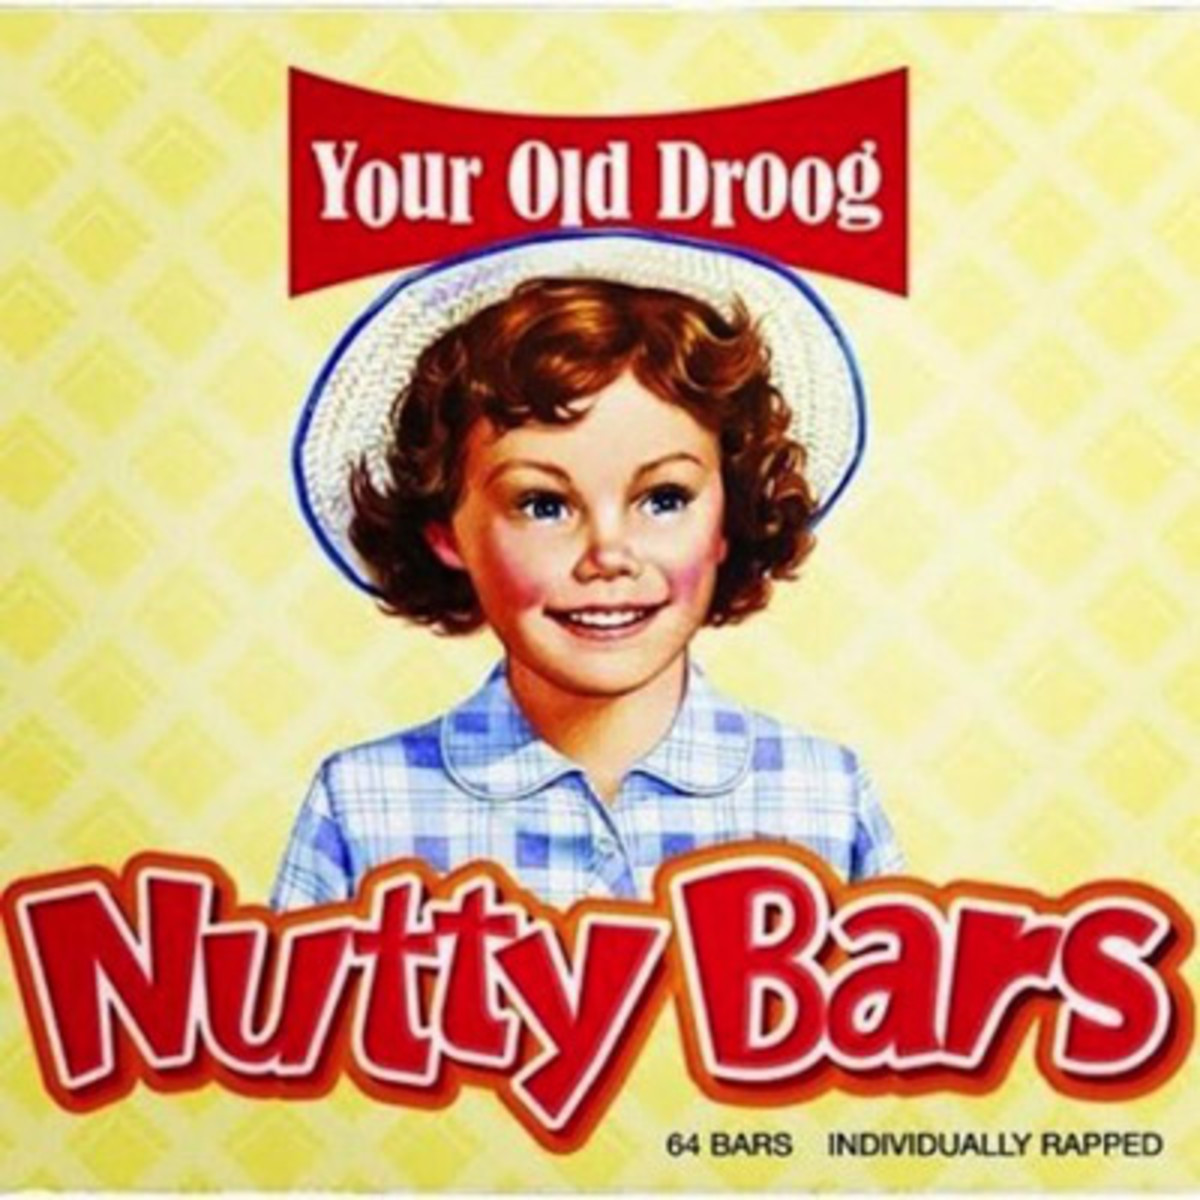 yourolddroog-nuttybars.jpg